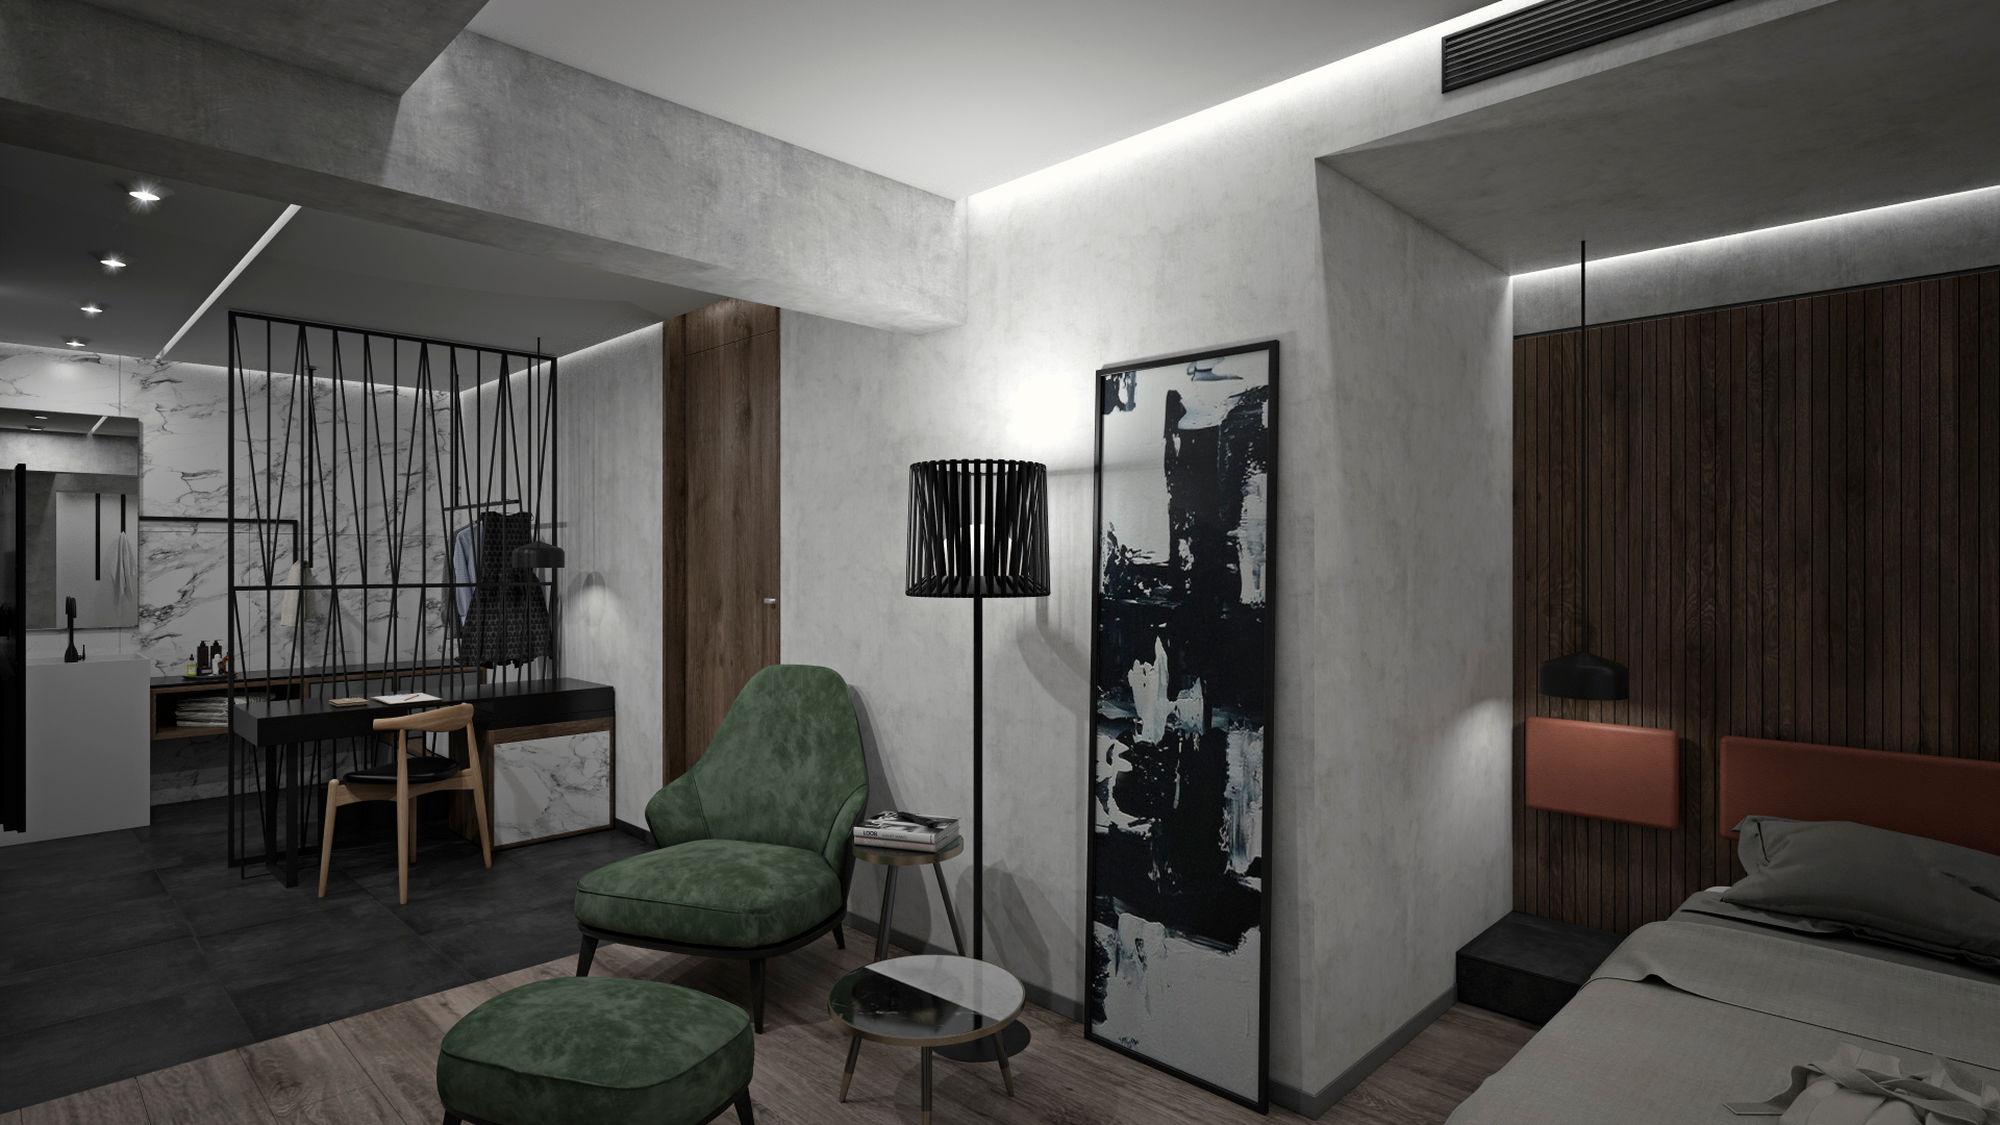 Dyo Suites Luxury Boutique Hotel Rethymno Crete - Osmium Suite